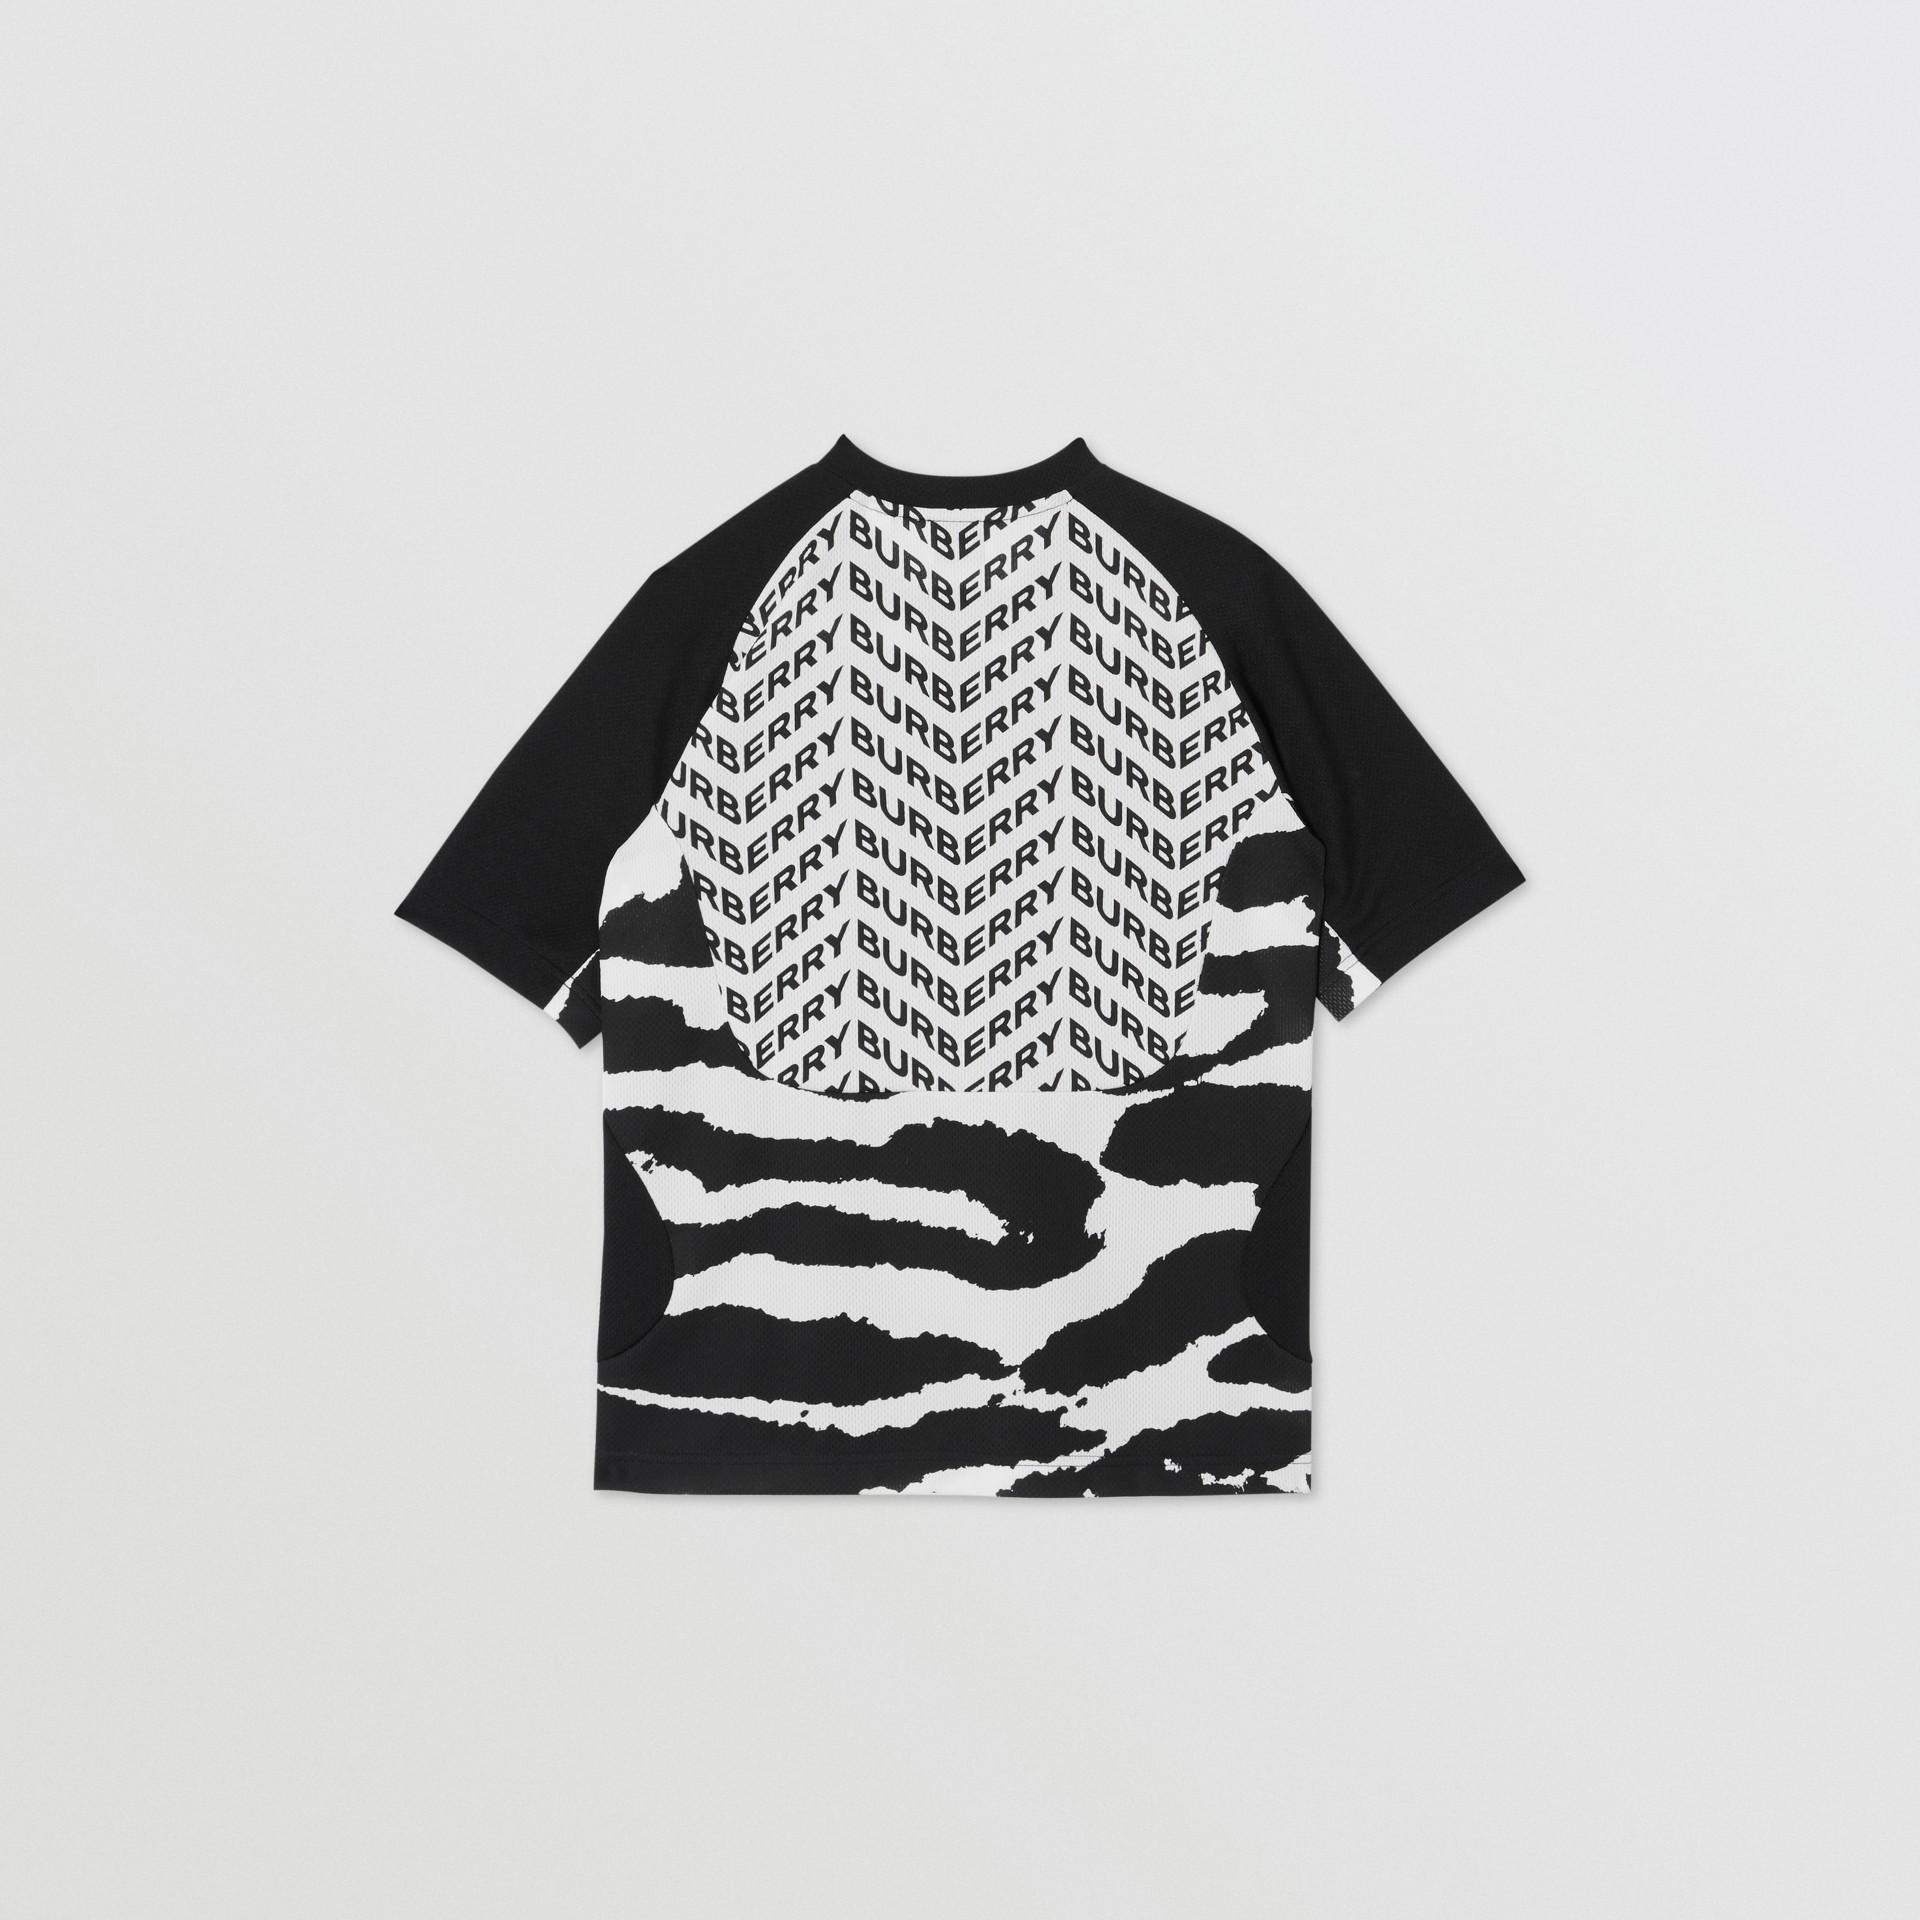 Kingdom 印花網眼 T 恤 (黑色) | Burberry - 圖庫照片 3